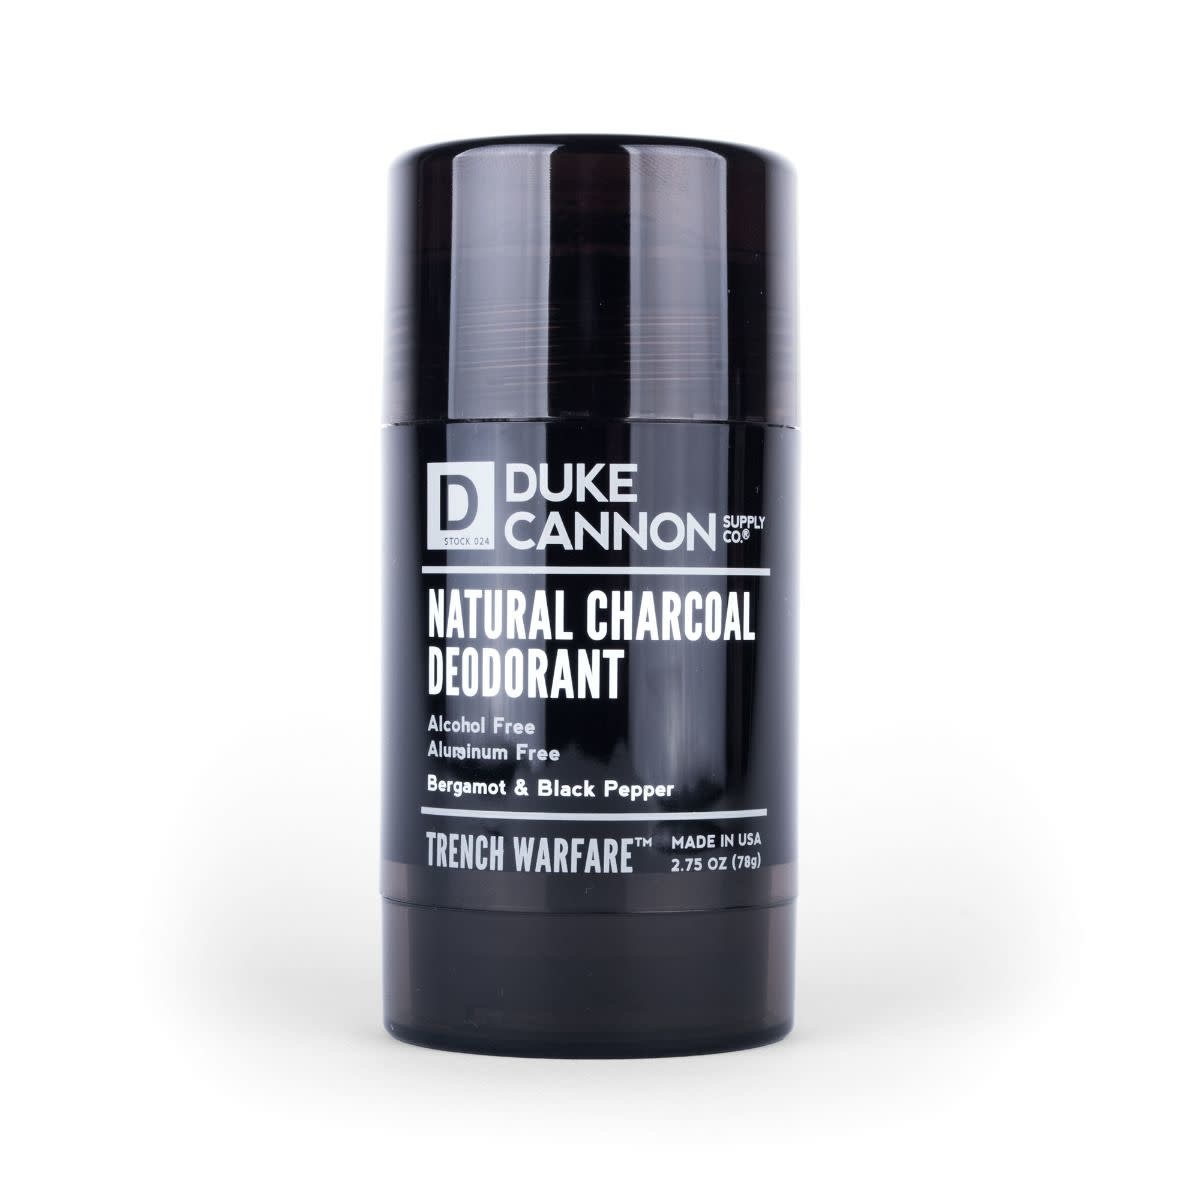 Duke Cannon Trench Warfare Bergamot & Black Pepper Natural Charcoal Deodorant